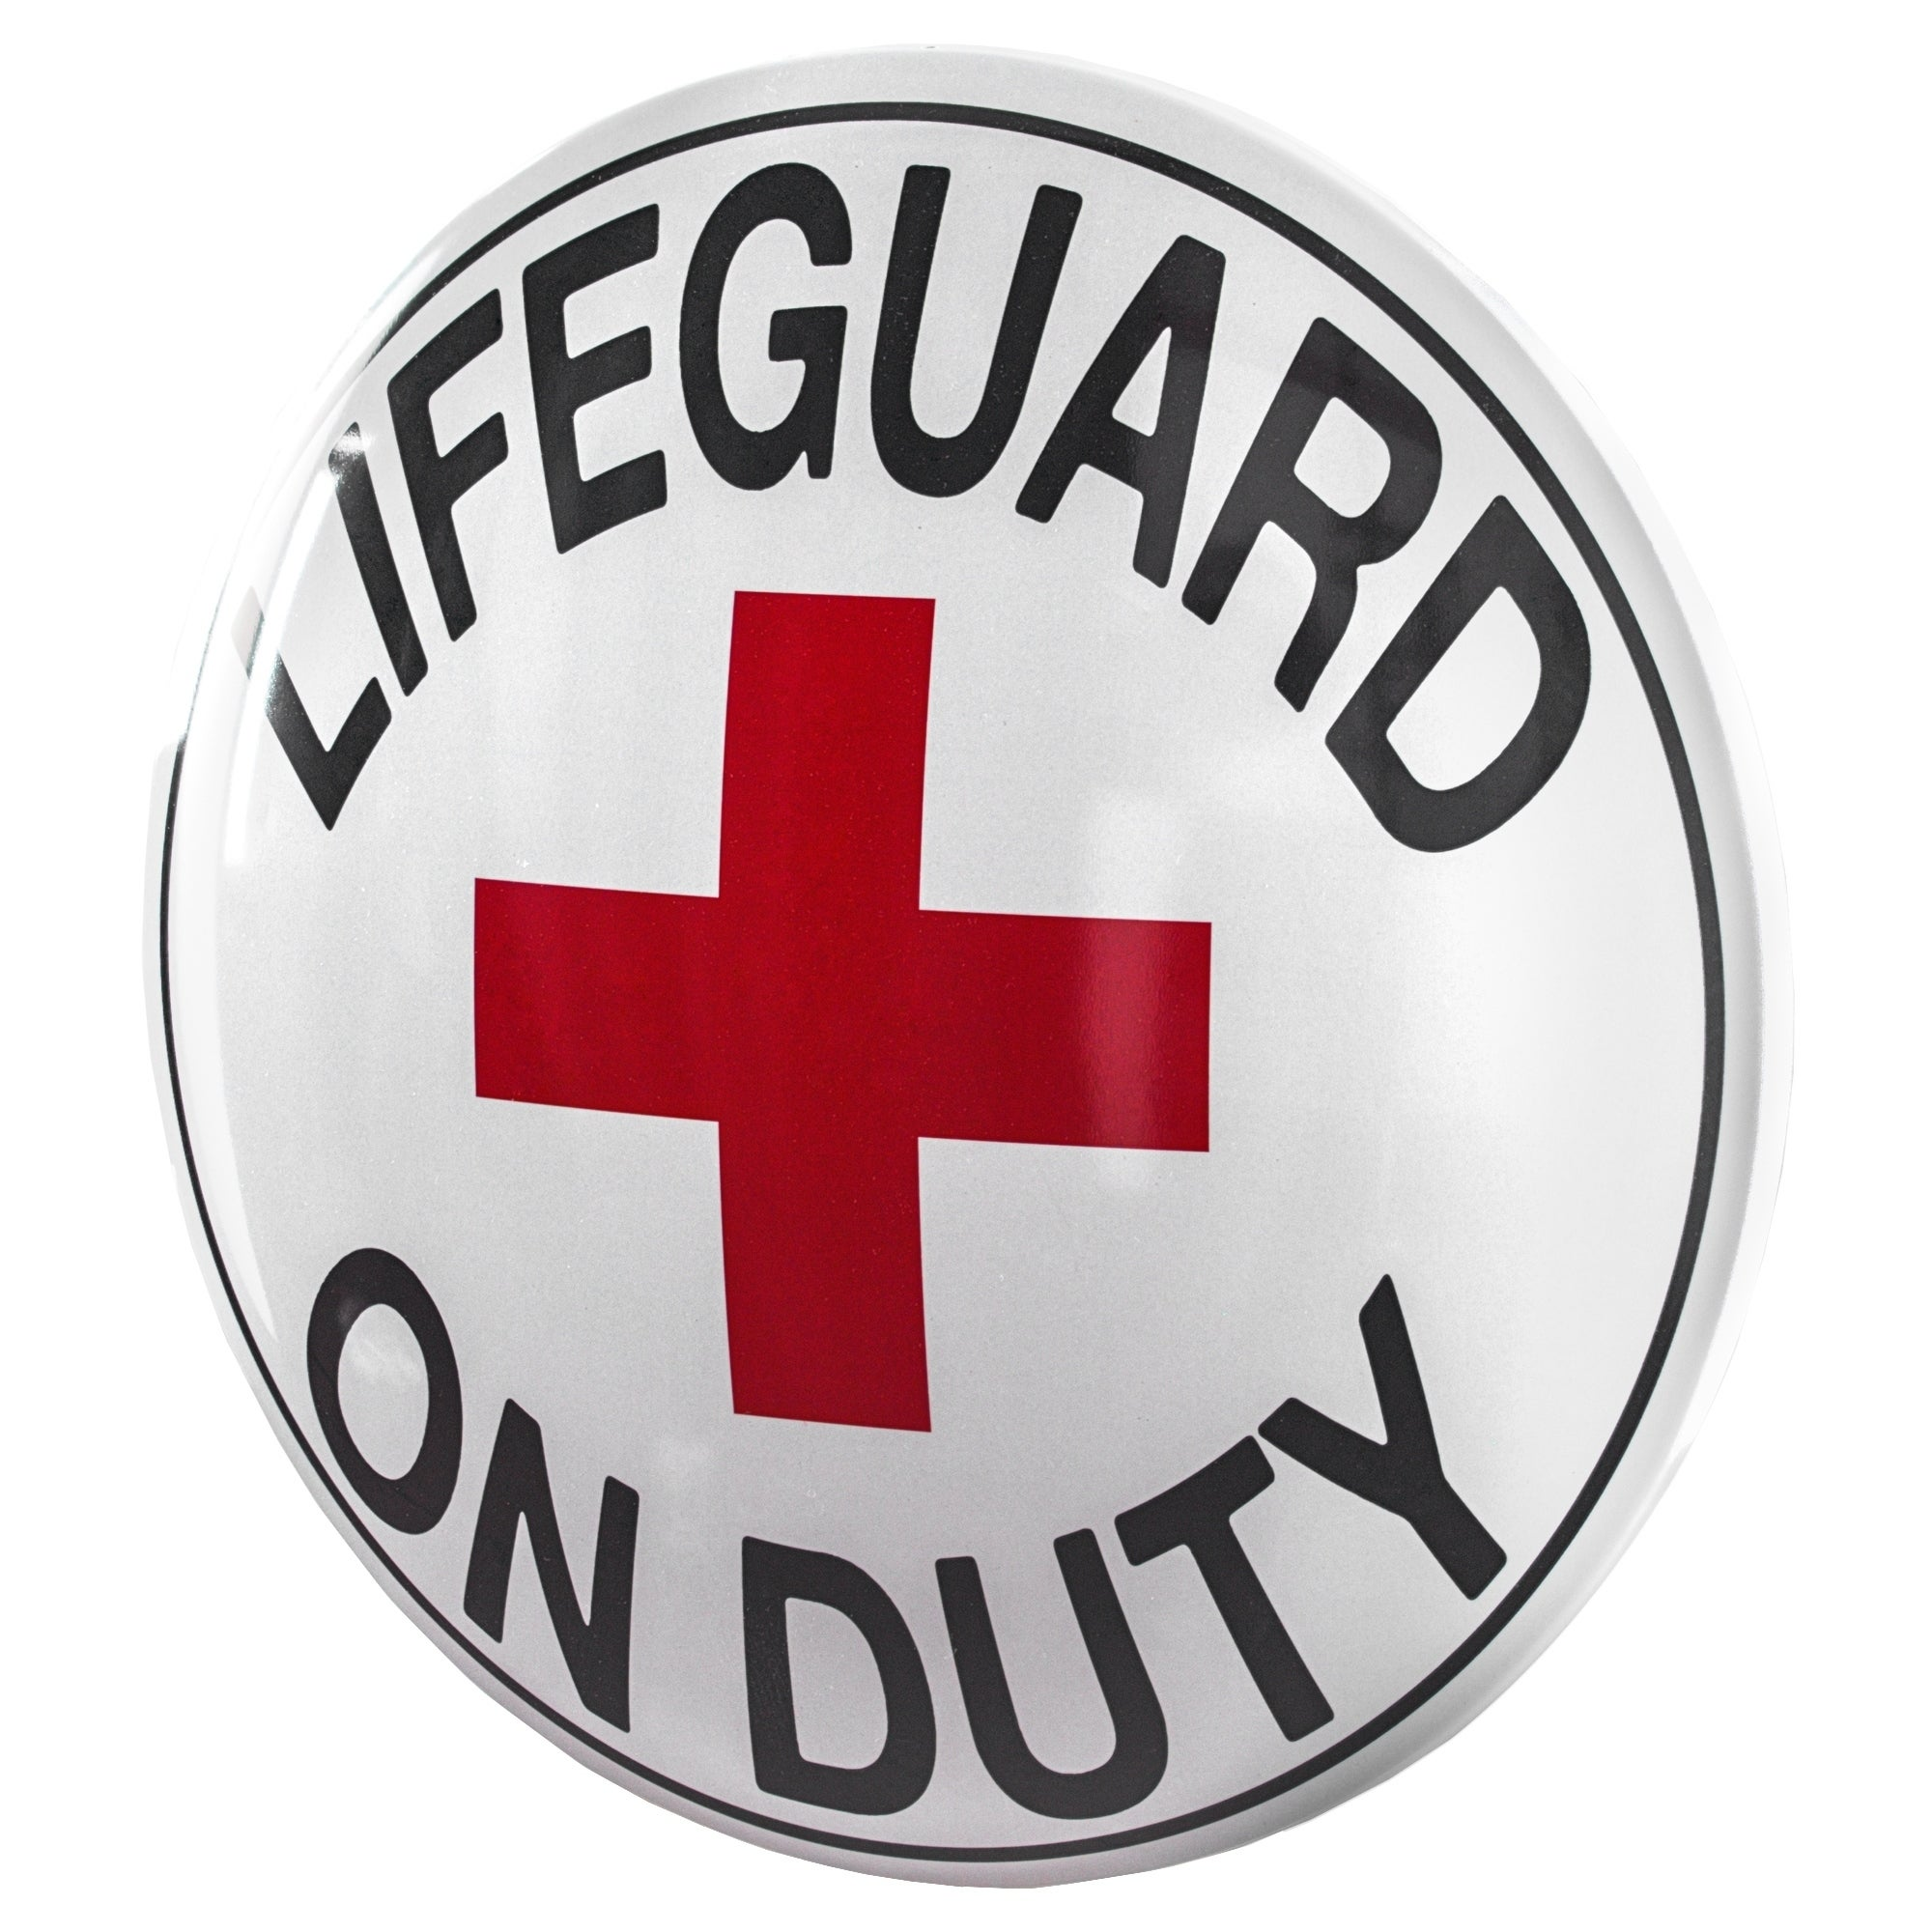 American Art Decor Lifeguard On Duty Metal Sign Wall Decor